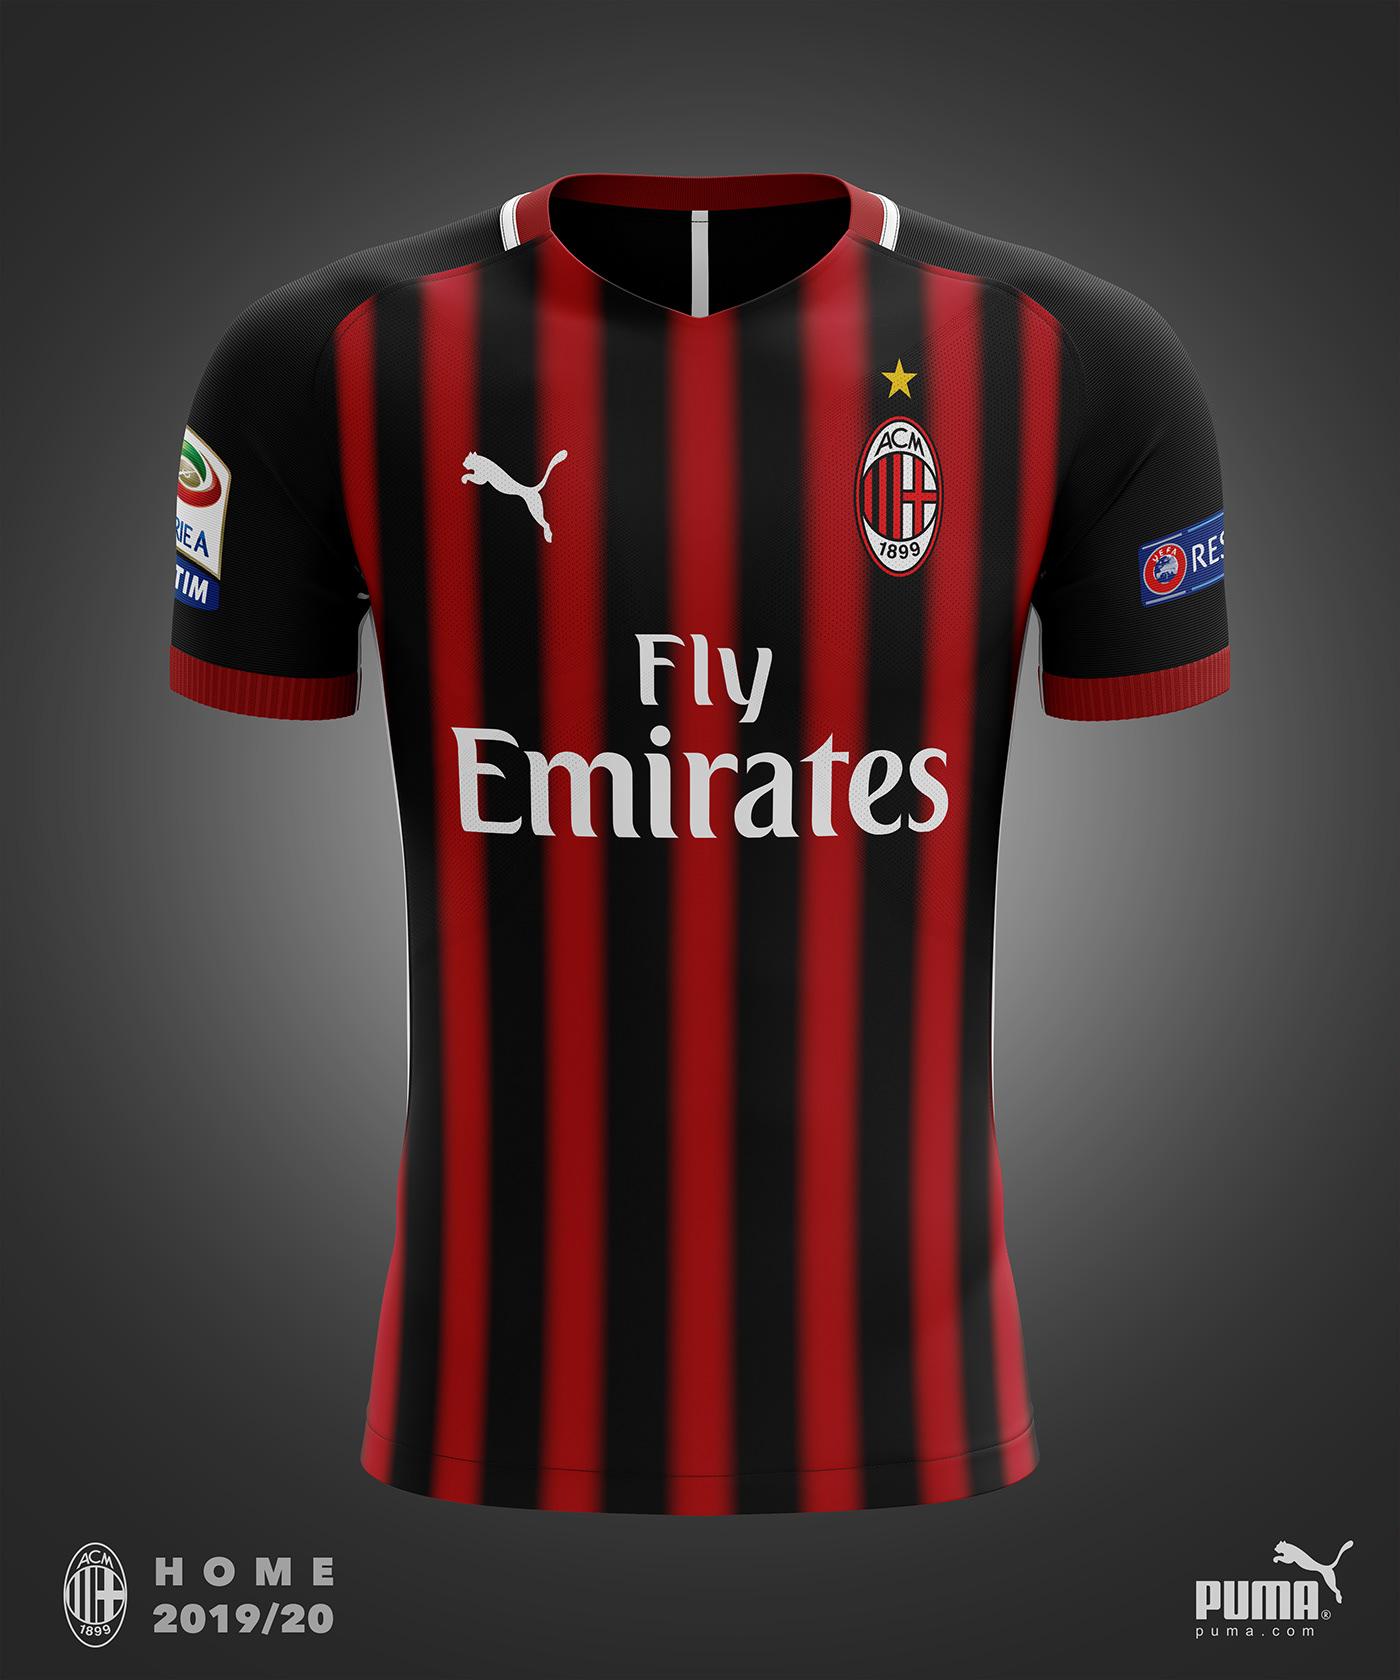 huge discount ca844 86d69 AC Milan Puma Concept Kit 2019/20 on Behance